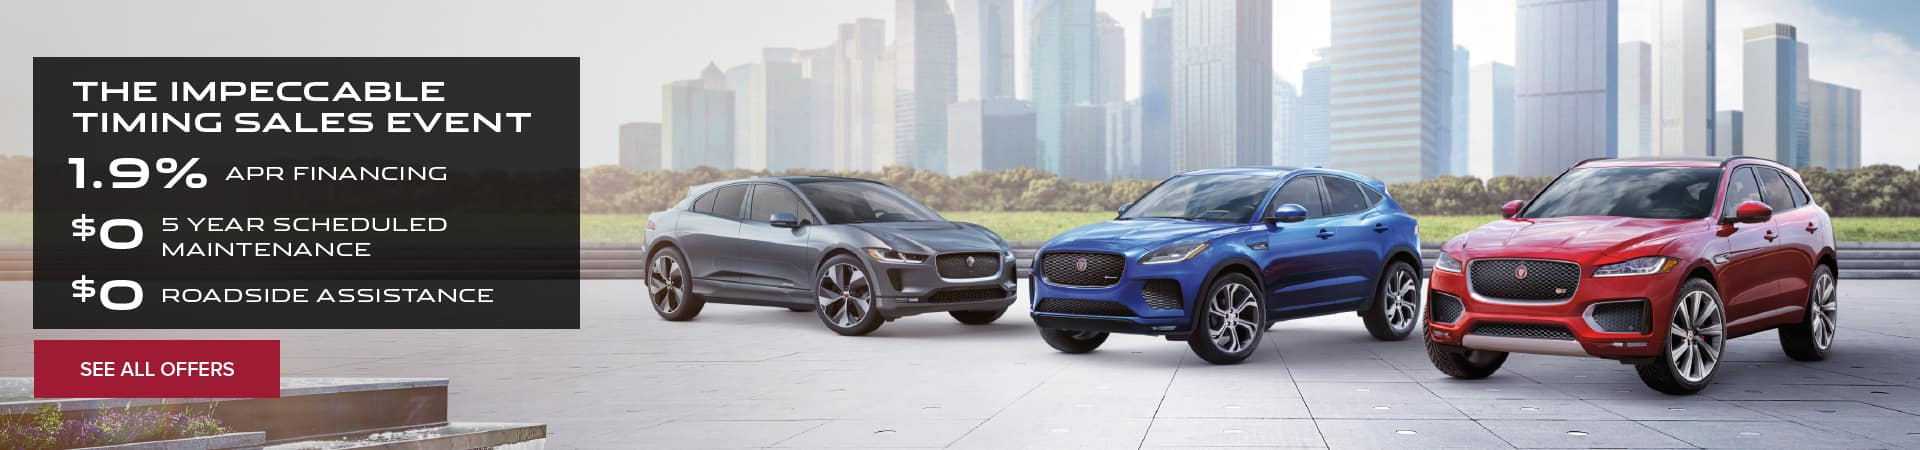 Autobahn Jaguar Fort Worth | The Impeccable Timing Sales Event